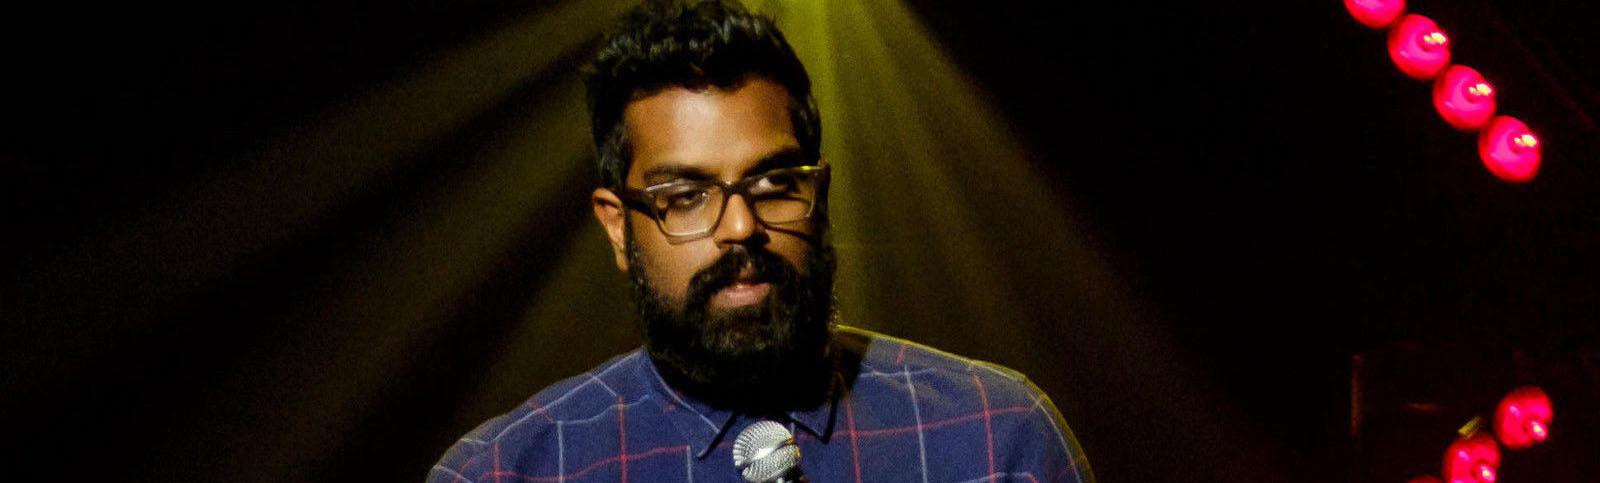 Romesh Ranganathan Tickets - StubHub UK 0cdd0a20d